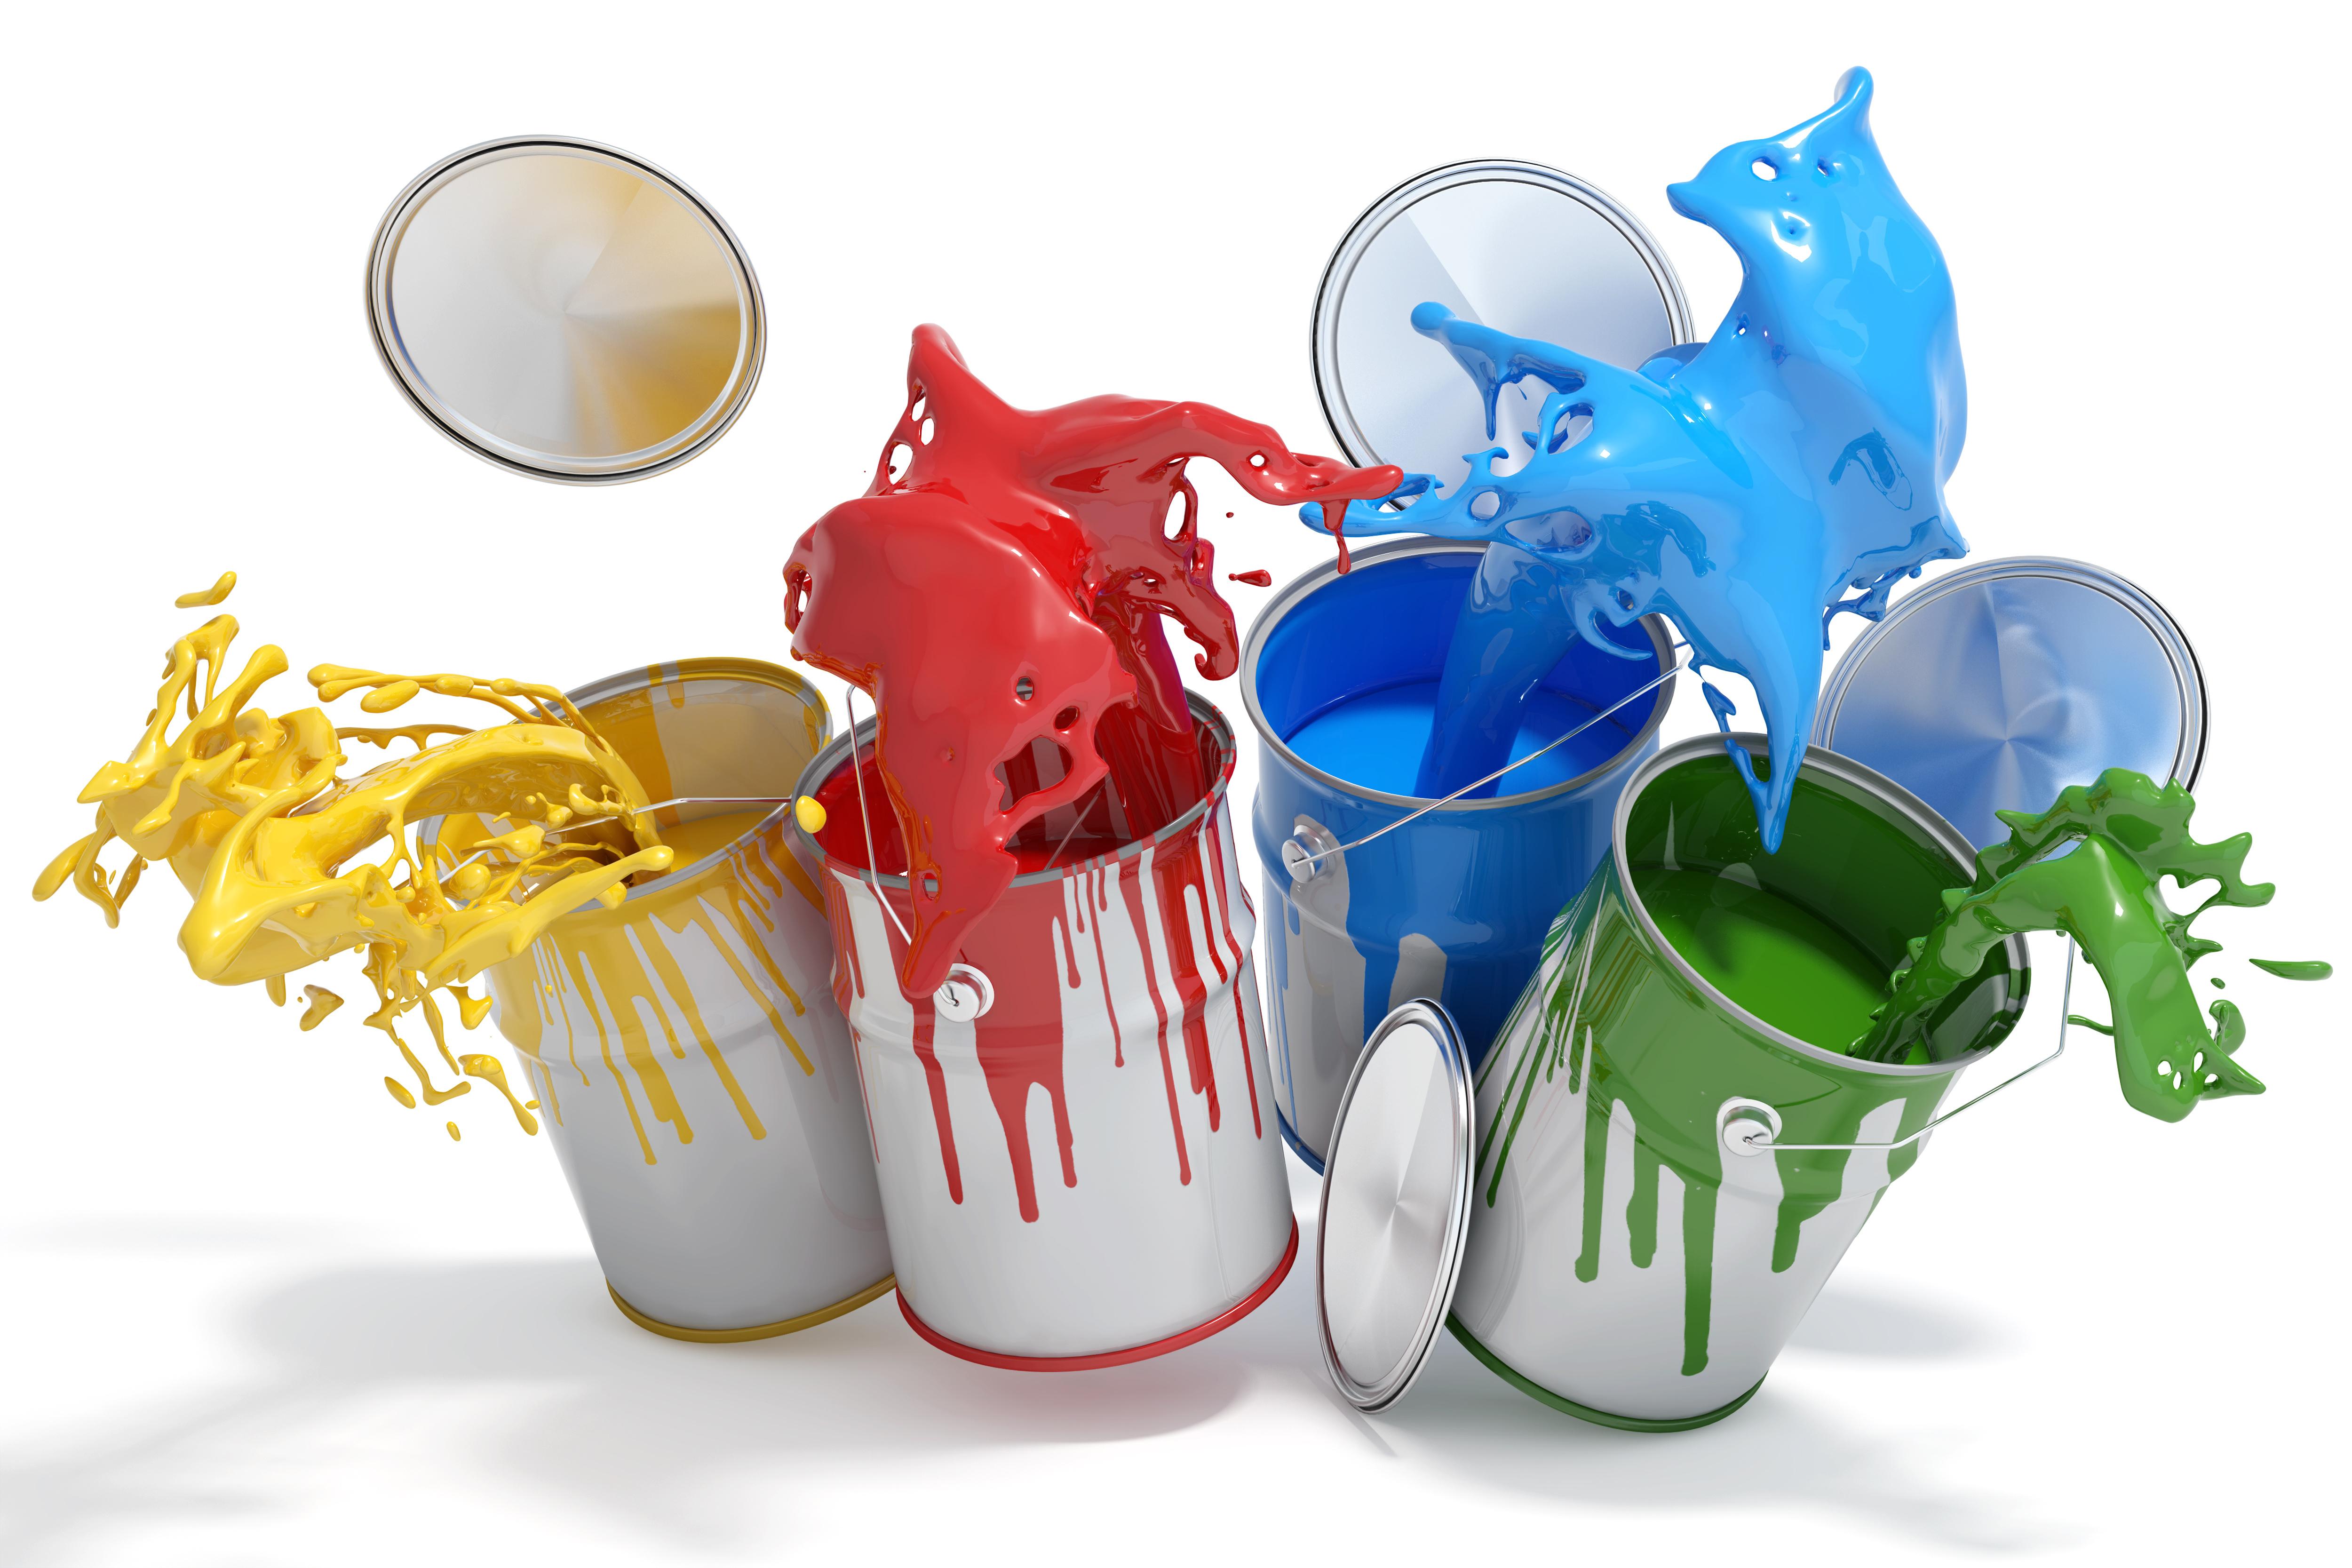 Kolorowe farby sklep